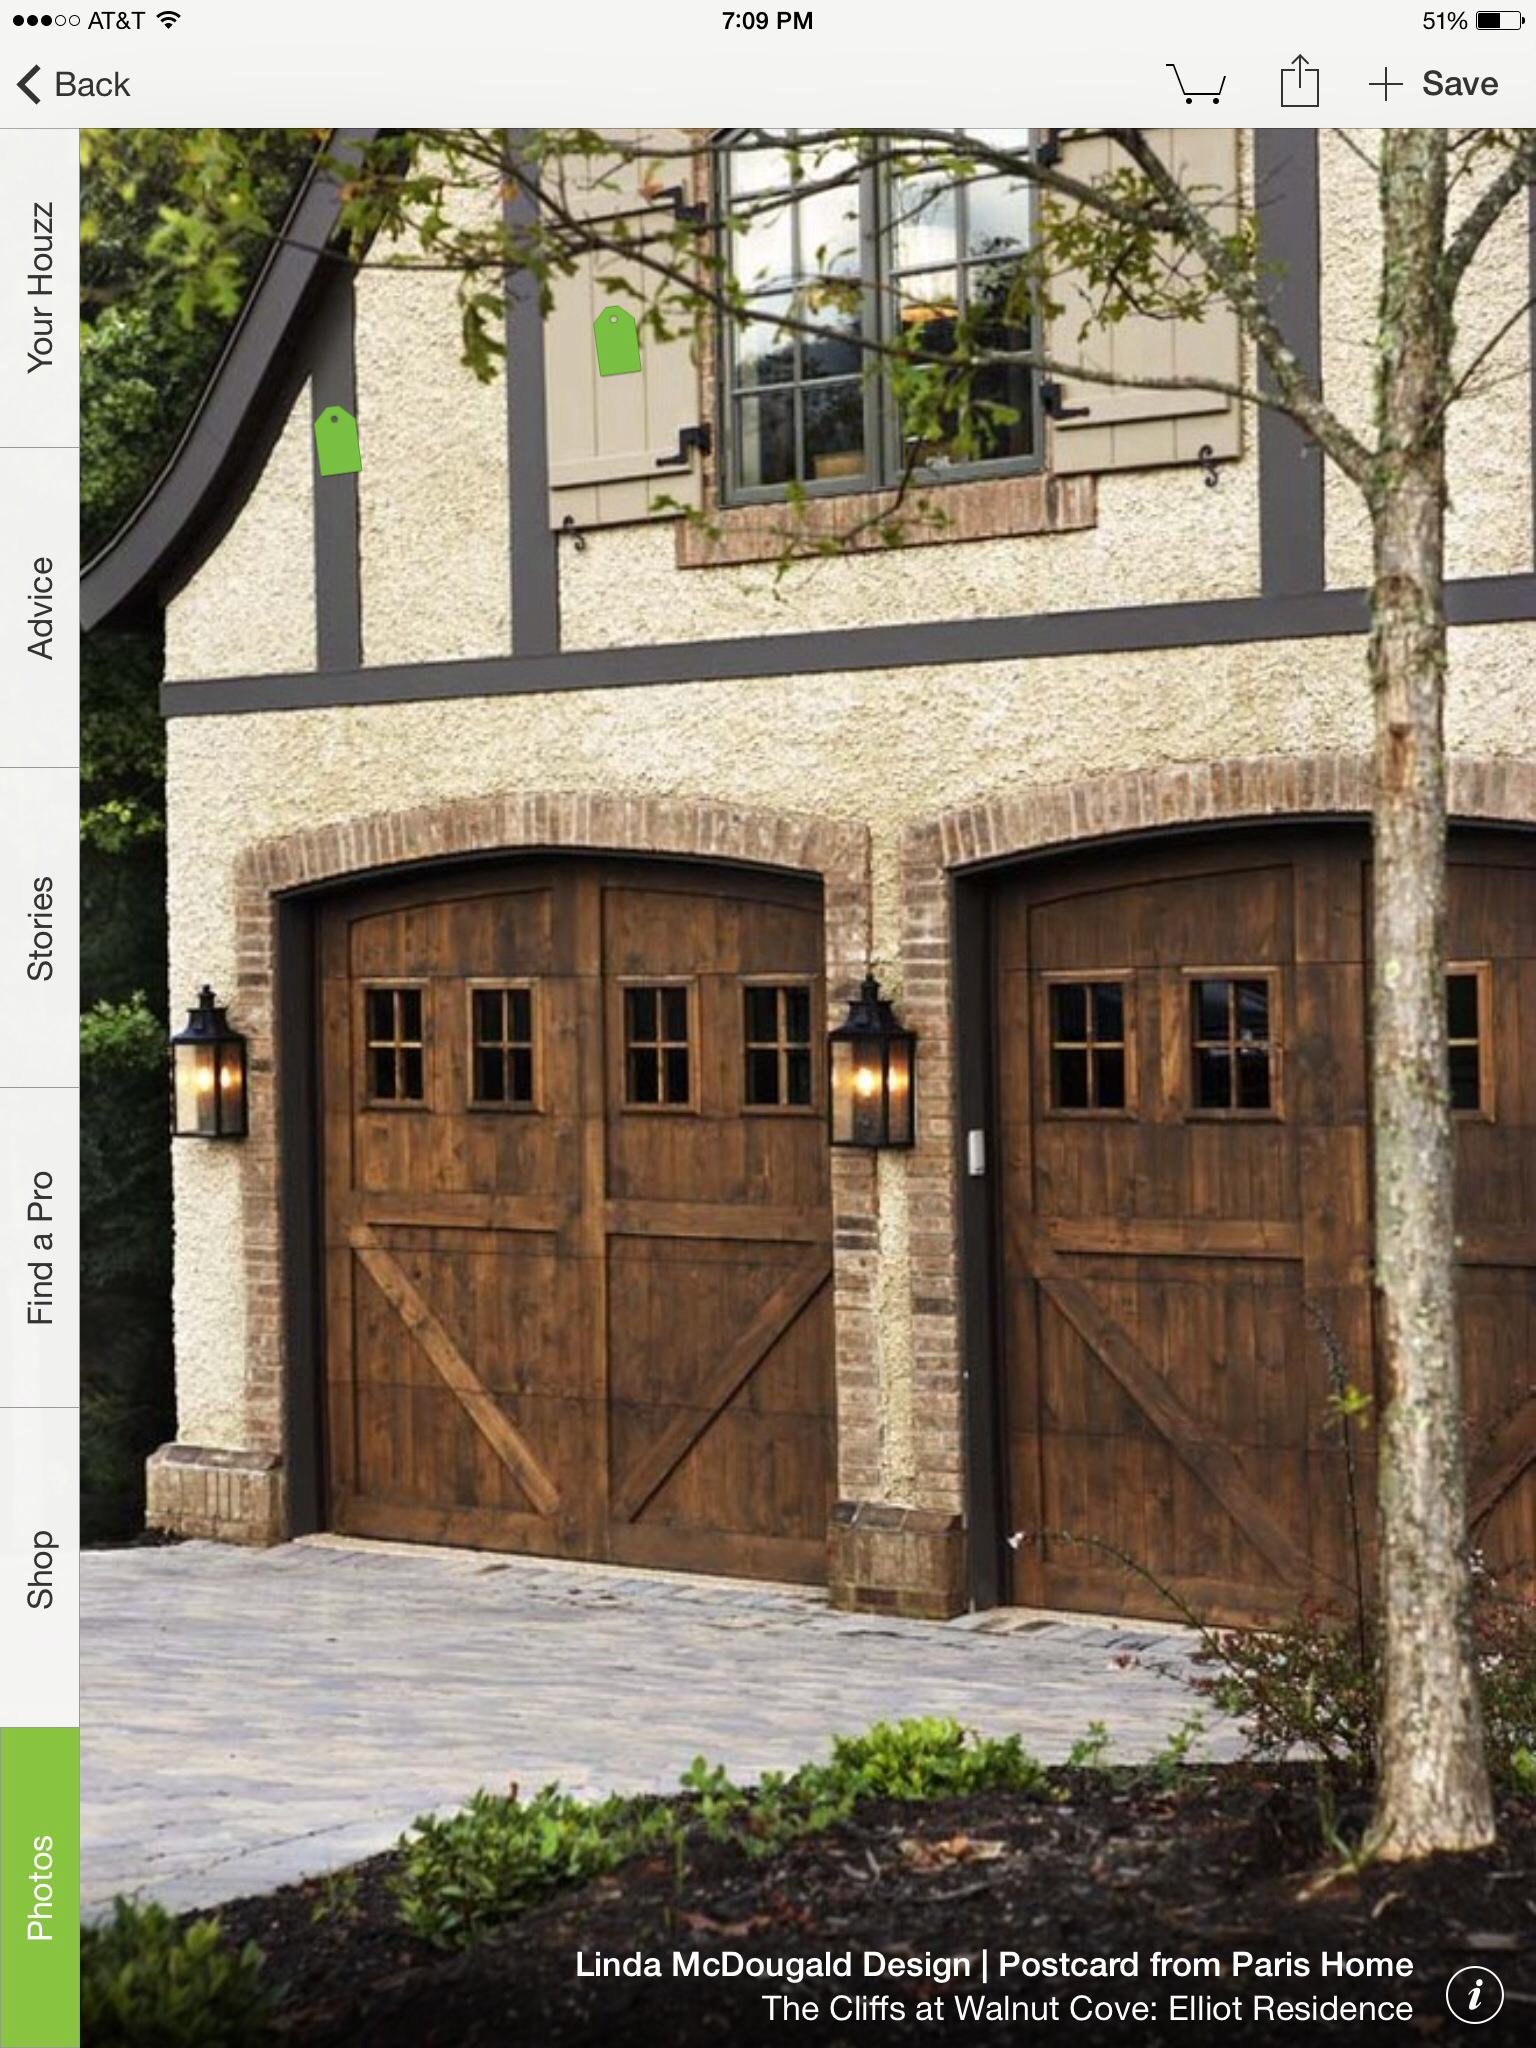 Garage door windows that open  Pin by Brooke Dillon on House designs  Pinterest  Garage doors